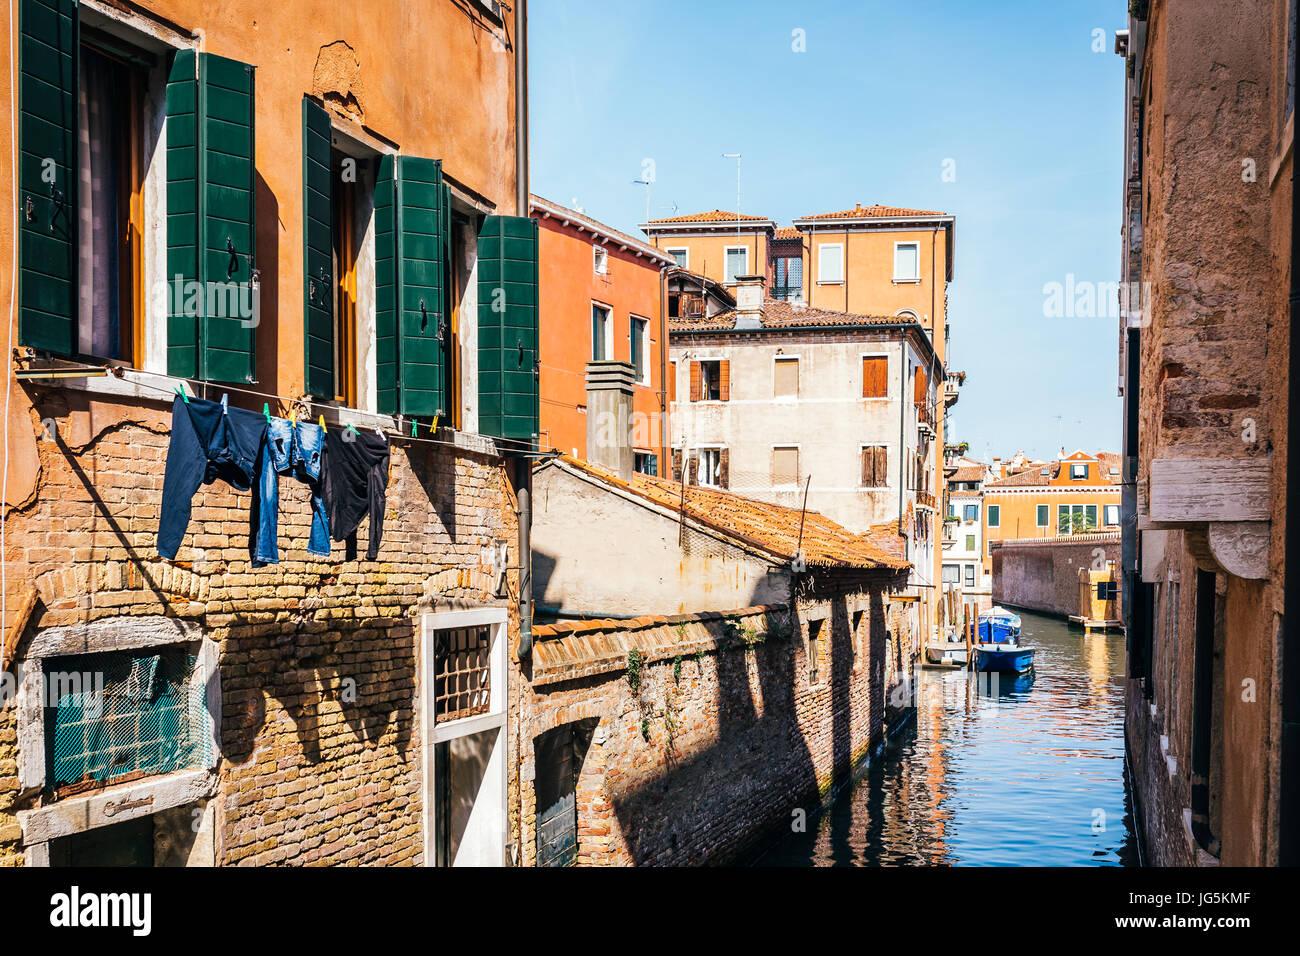 Traveling around Italy, Europe - Stock Image